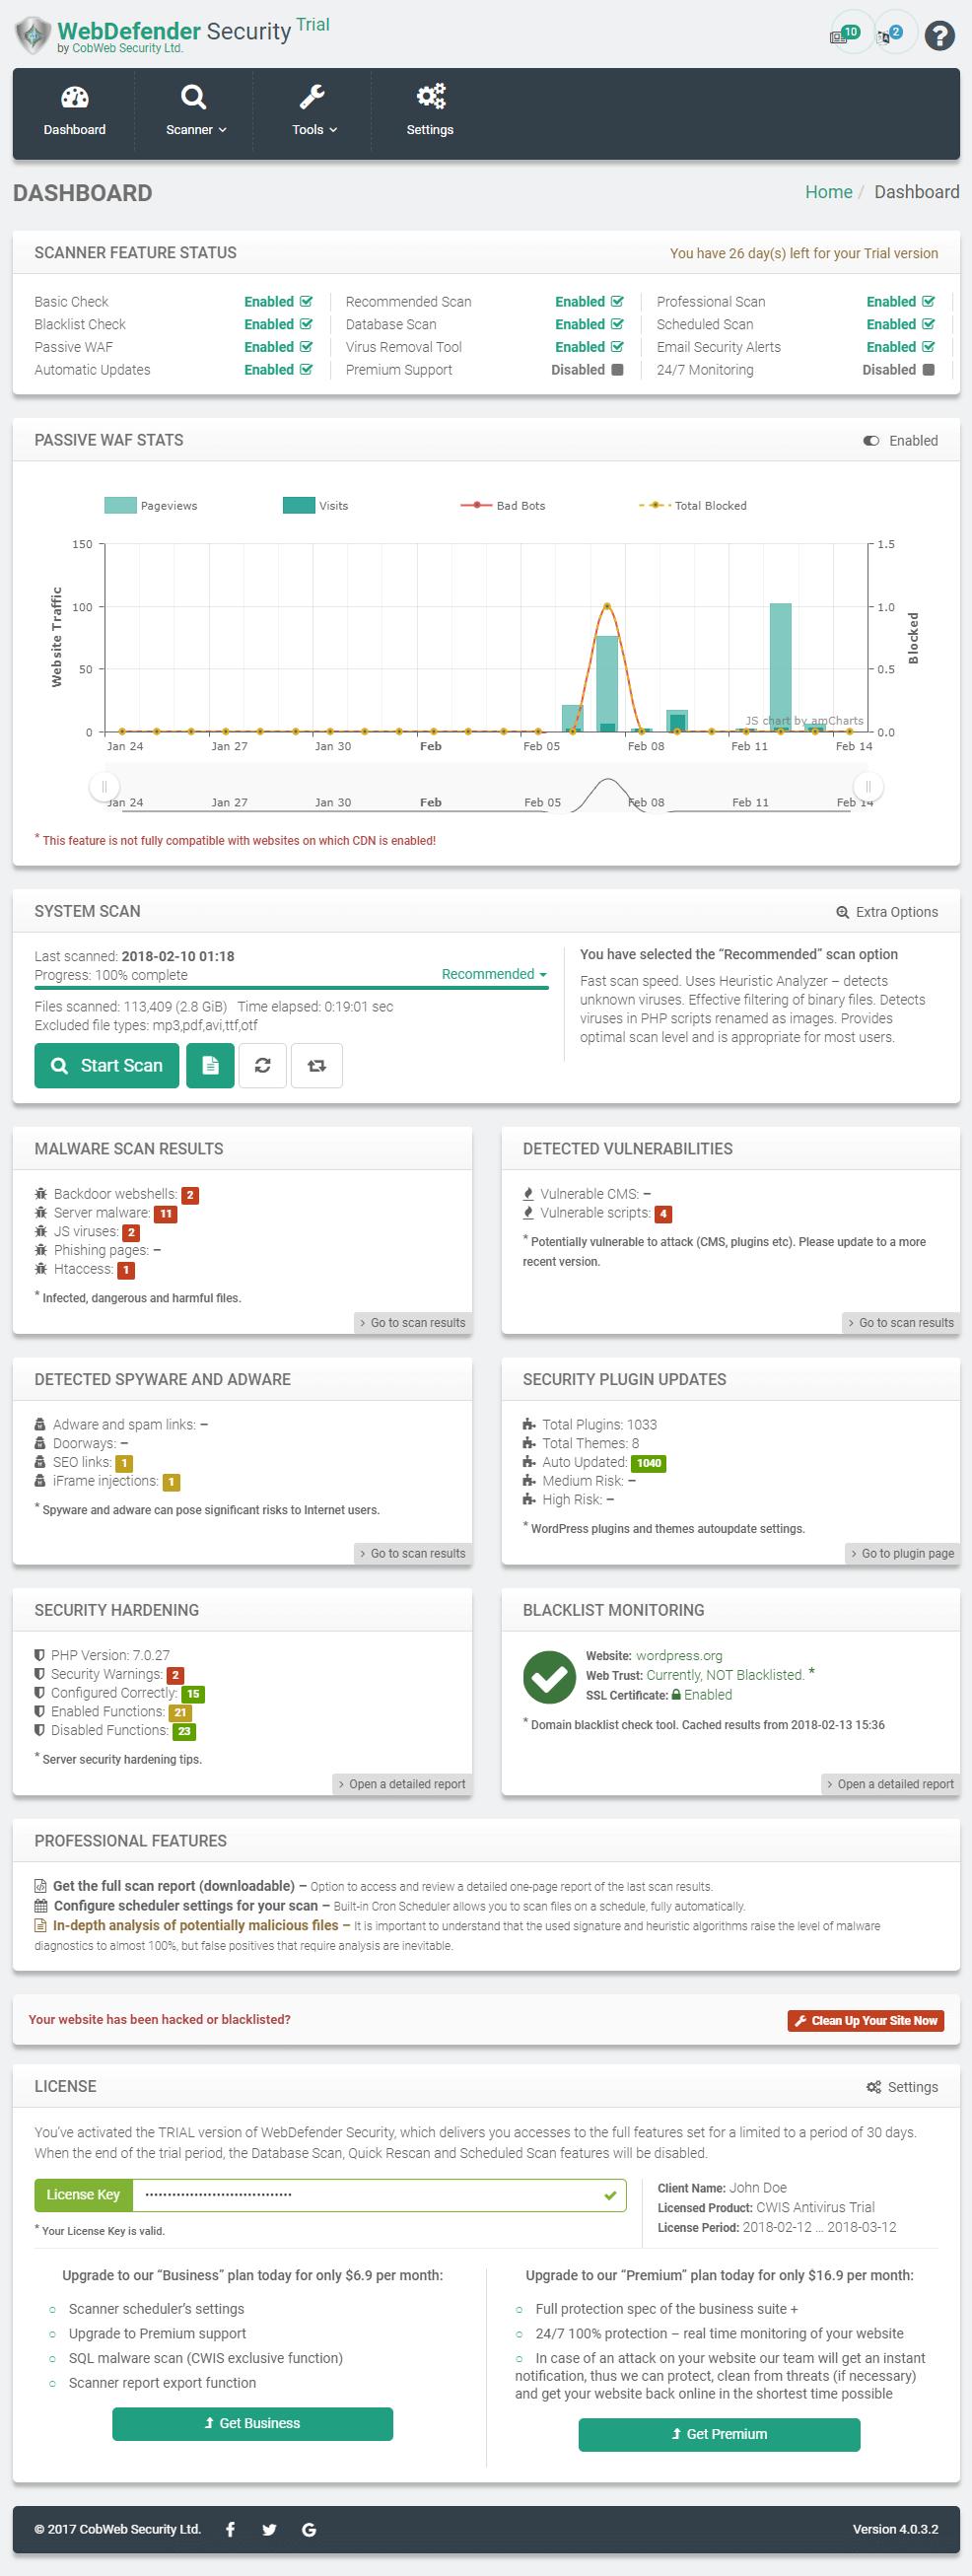 WebDefender Security Dashboard Control Panel